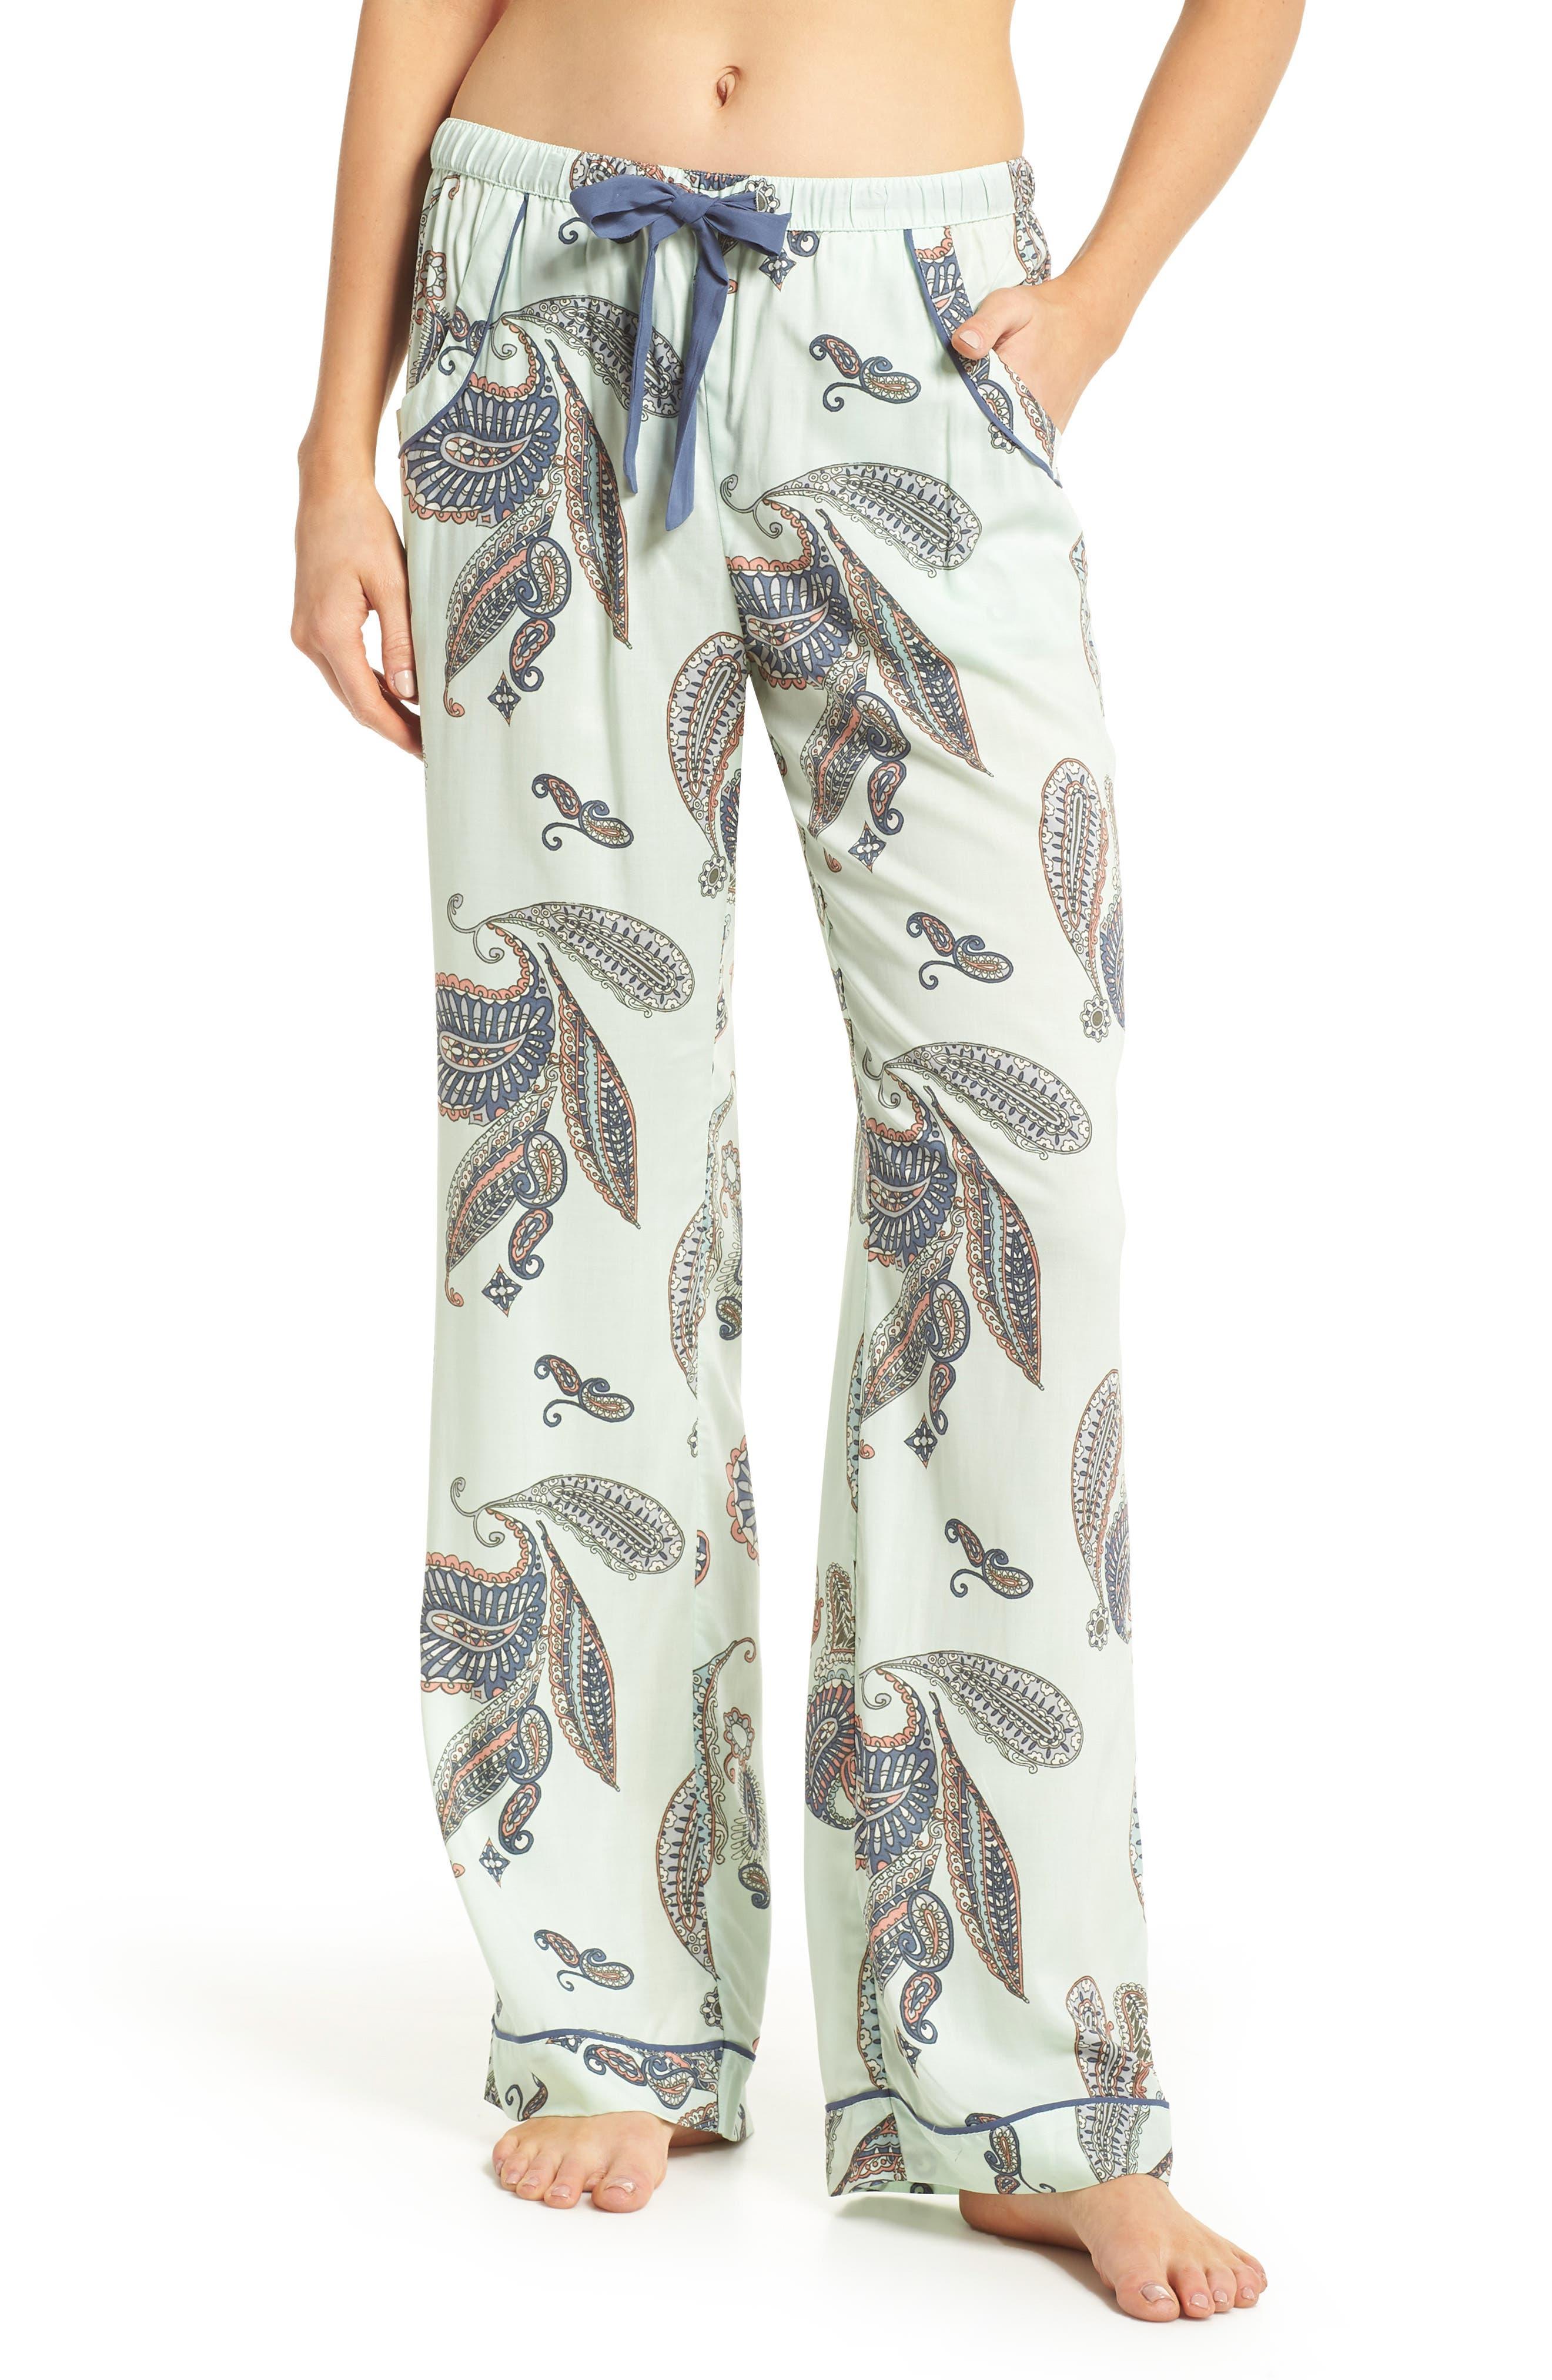 Sweet Dreams Lounge Pants,                         Main,                         color, 330